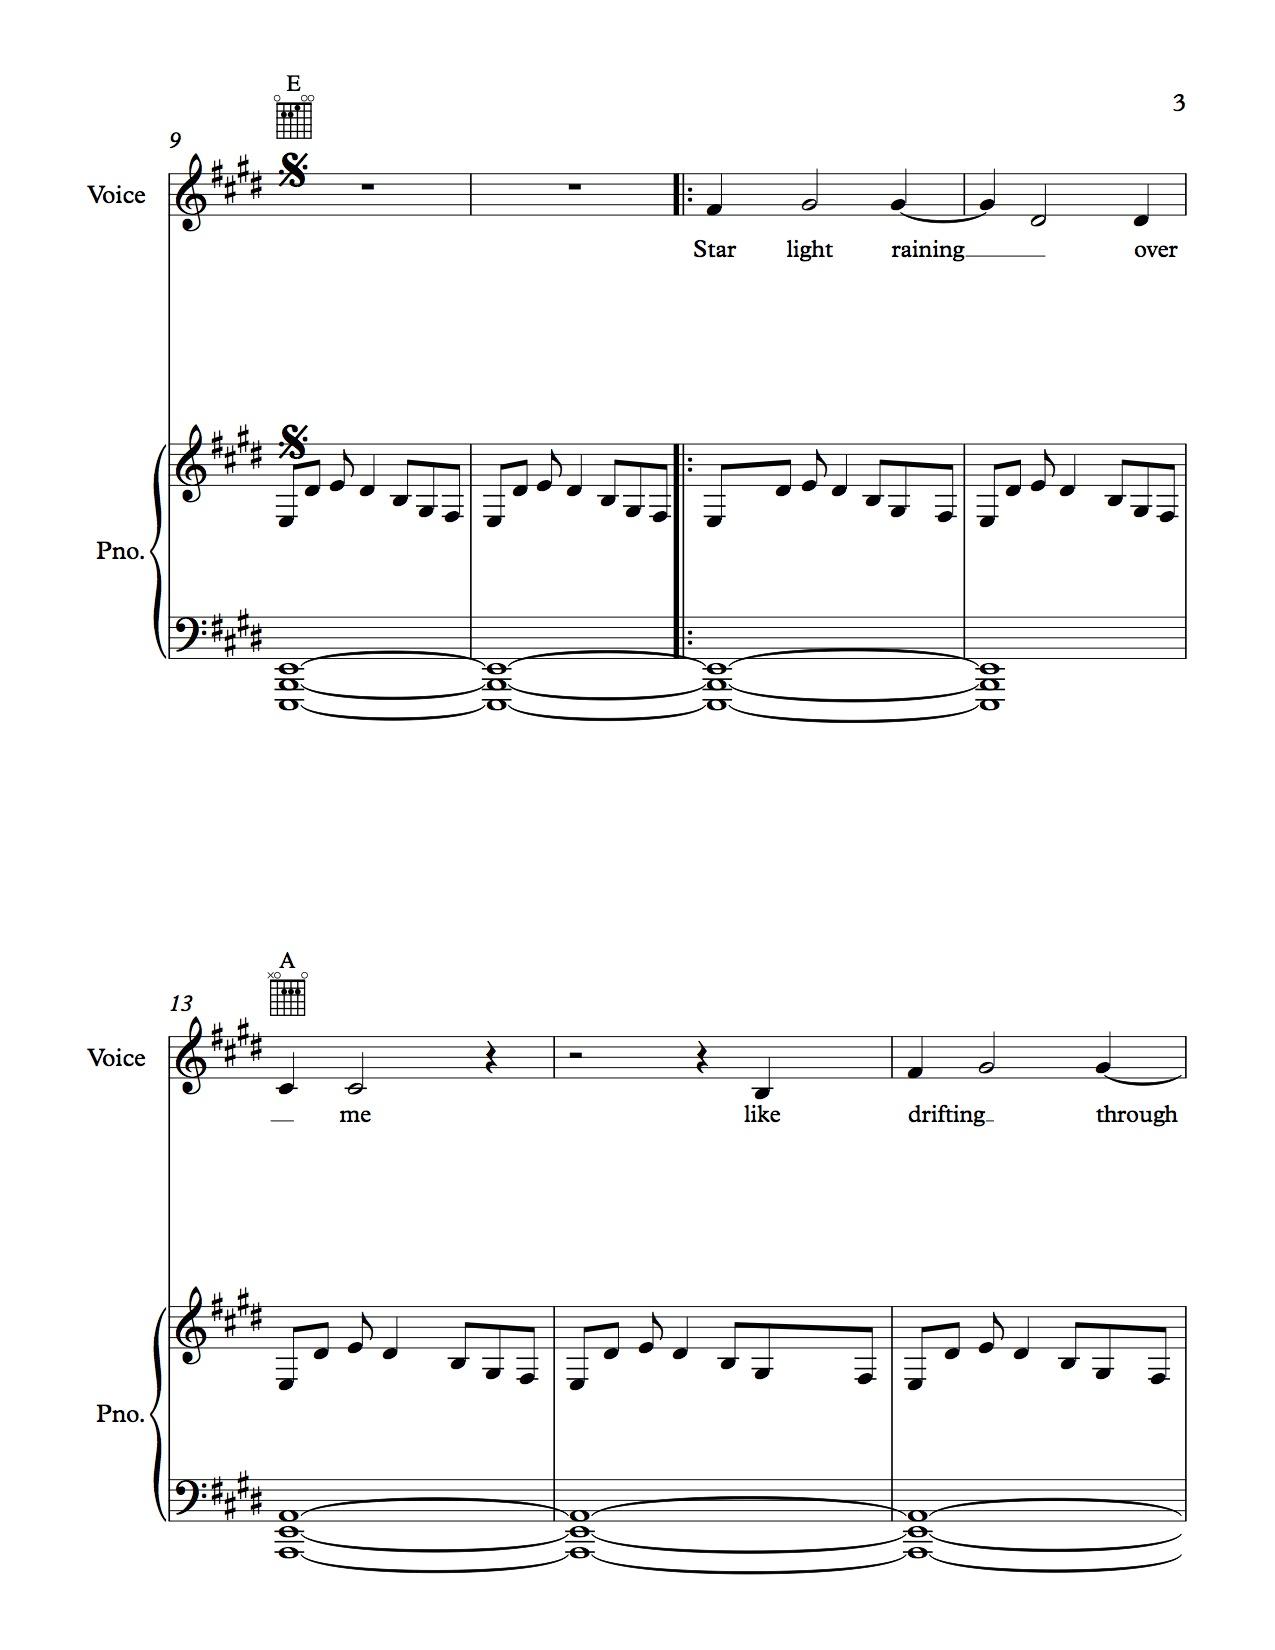 Starlight Score (1st Draft) (1).jpg